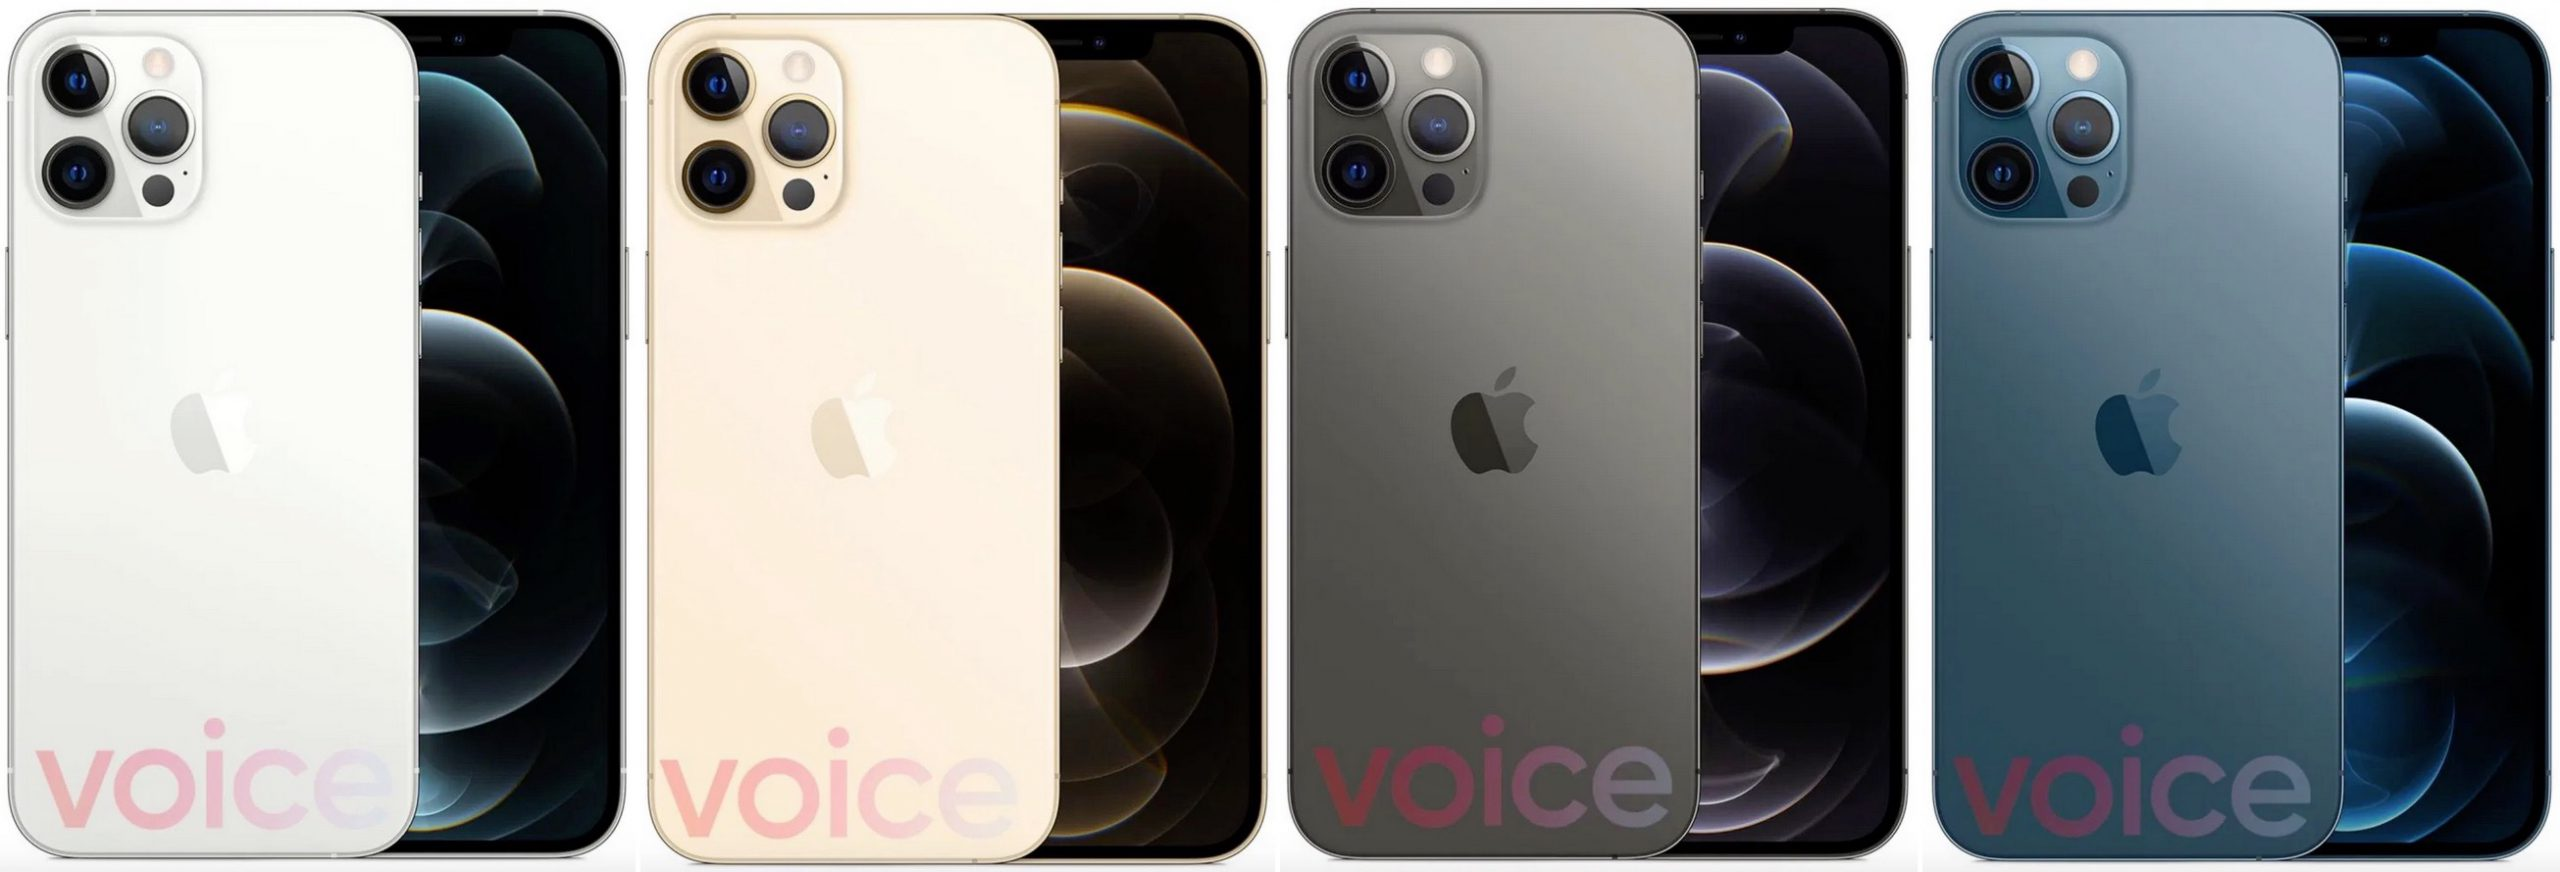 Coloris iPhone 12